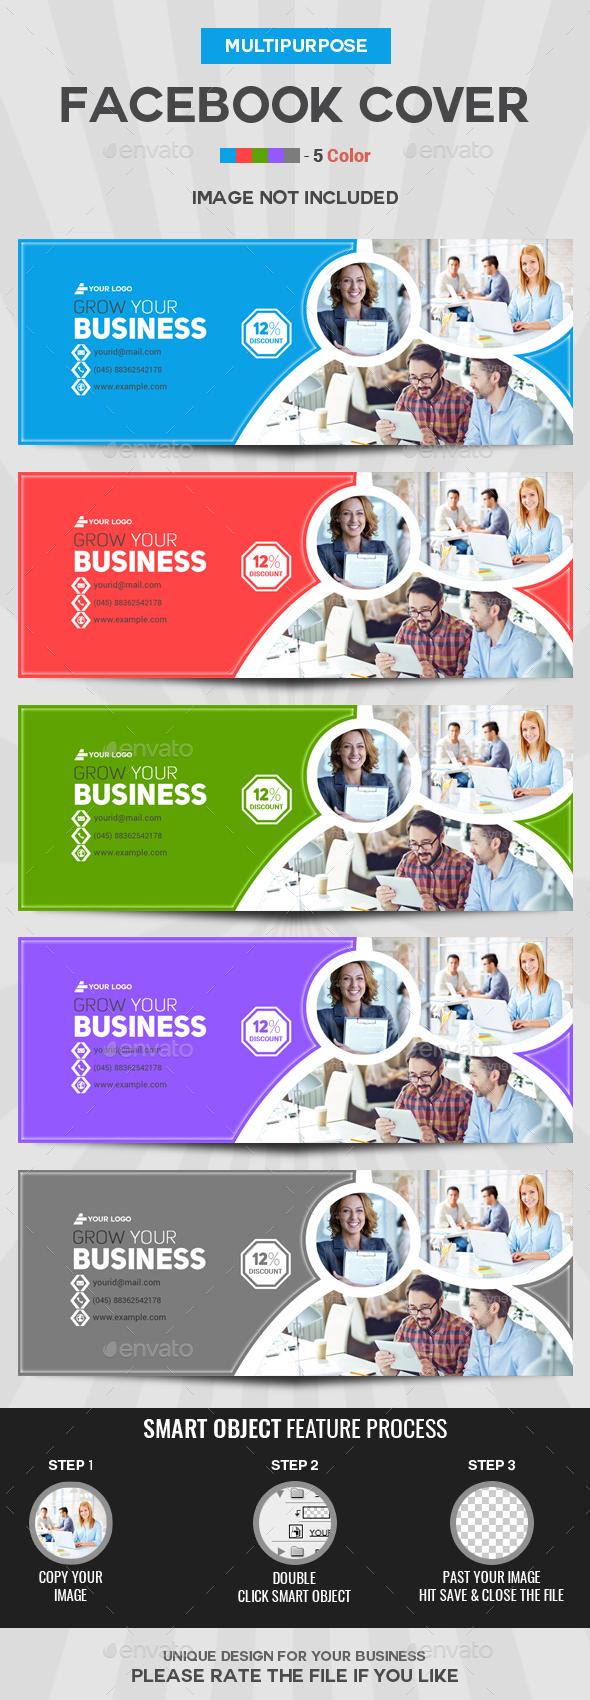 Facebook Cover - 5 Color - Facebook Timeline Covers Social Media